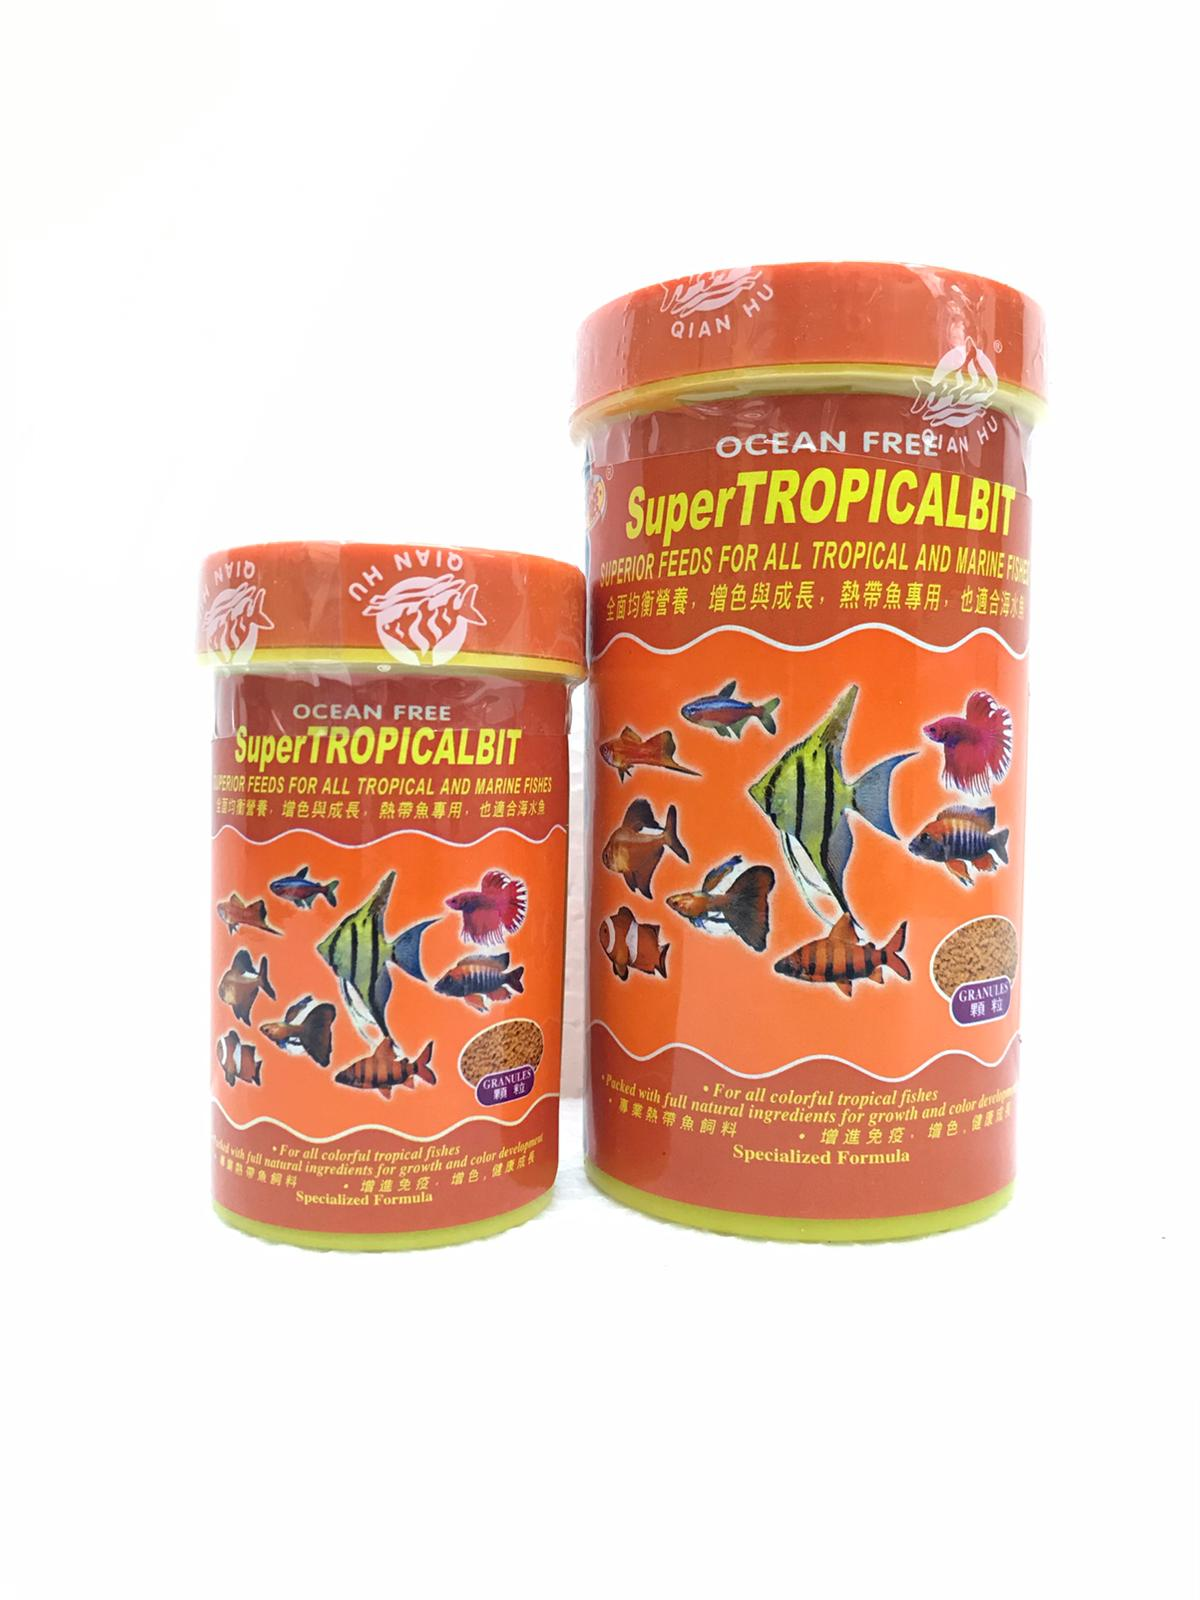 OF Super Tropical Bit Superior Feeds